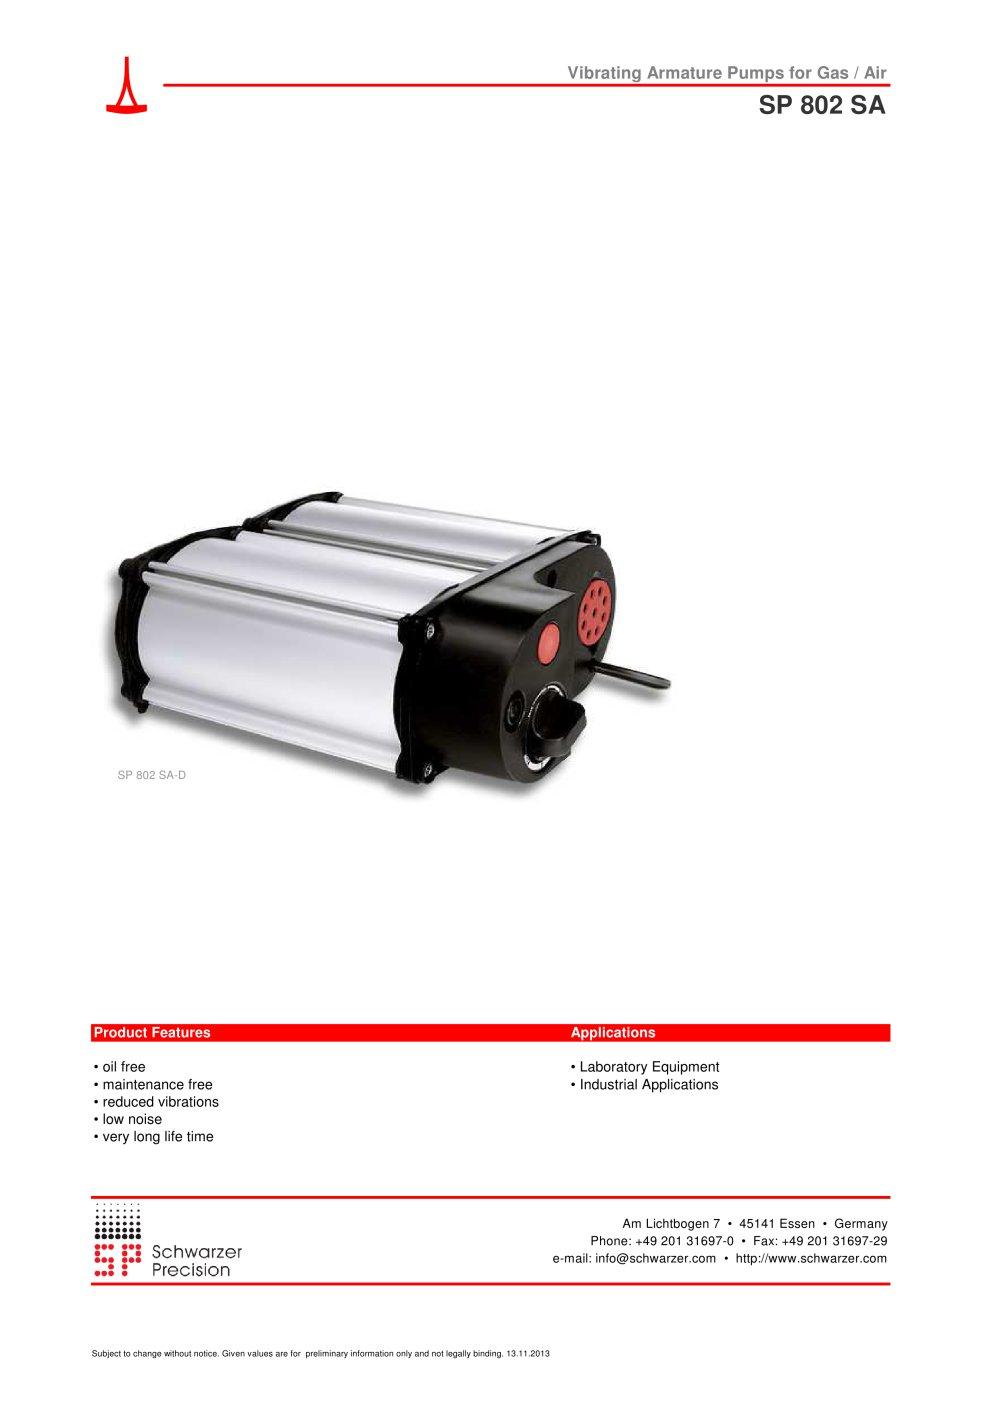 802 sa d dd vibrating diaphragm pumps schwarzer precision pdf 802 sa d dd vibrating diaphragm pumps 1 3 pages ccuart Image collections